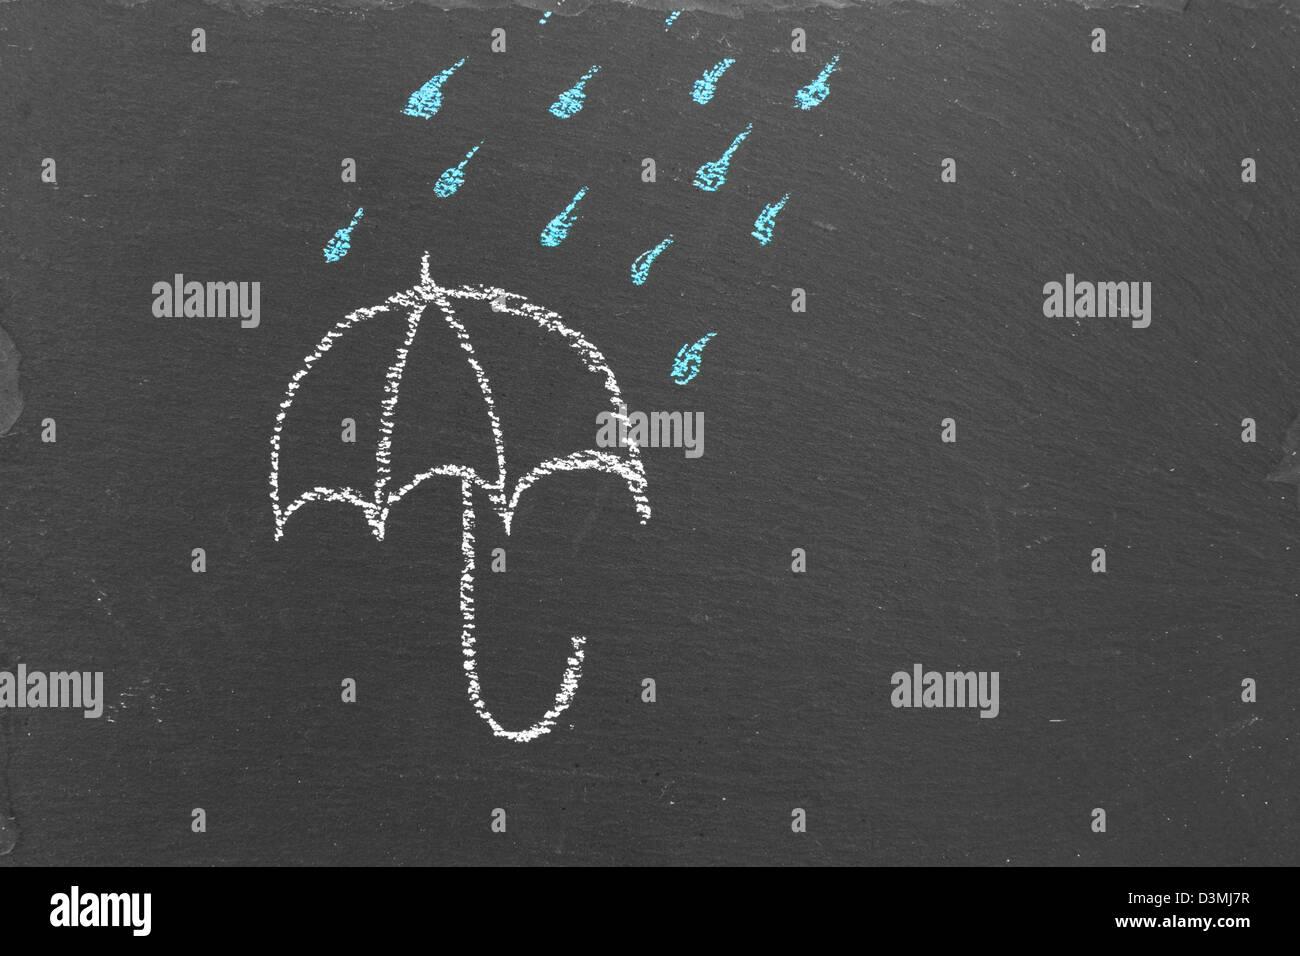 Chalk drawing of an umbrella and rain drops on slate - Stock Image